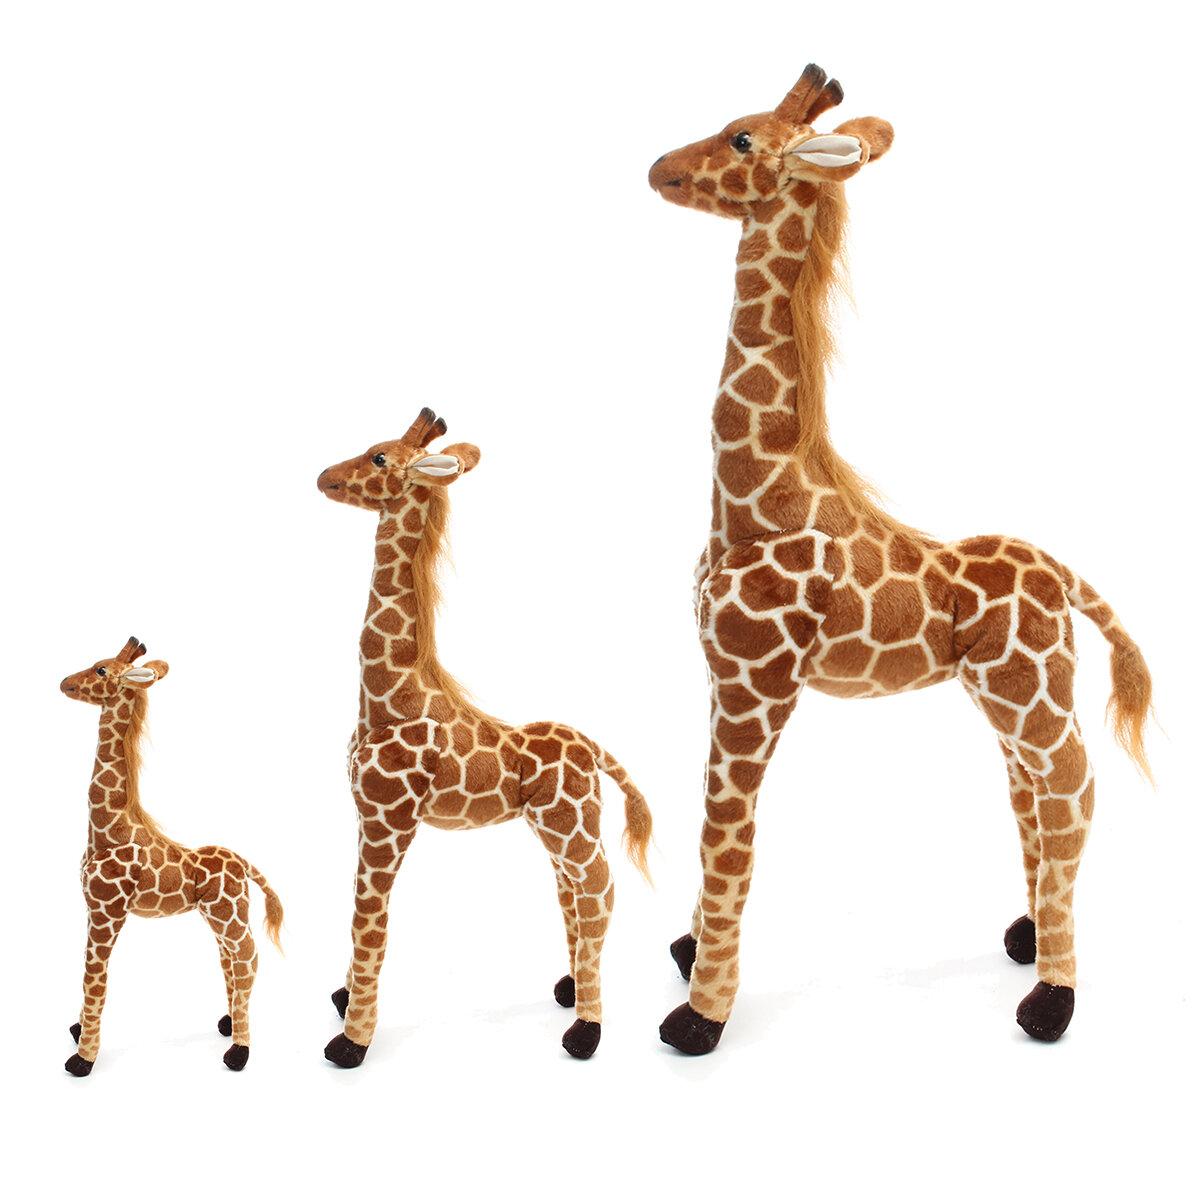 Baby Kids Plush Giraffe Toy Doll Giant Large Stuffed Animals Soft Doll Gift BR